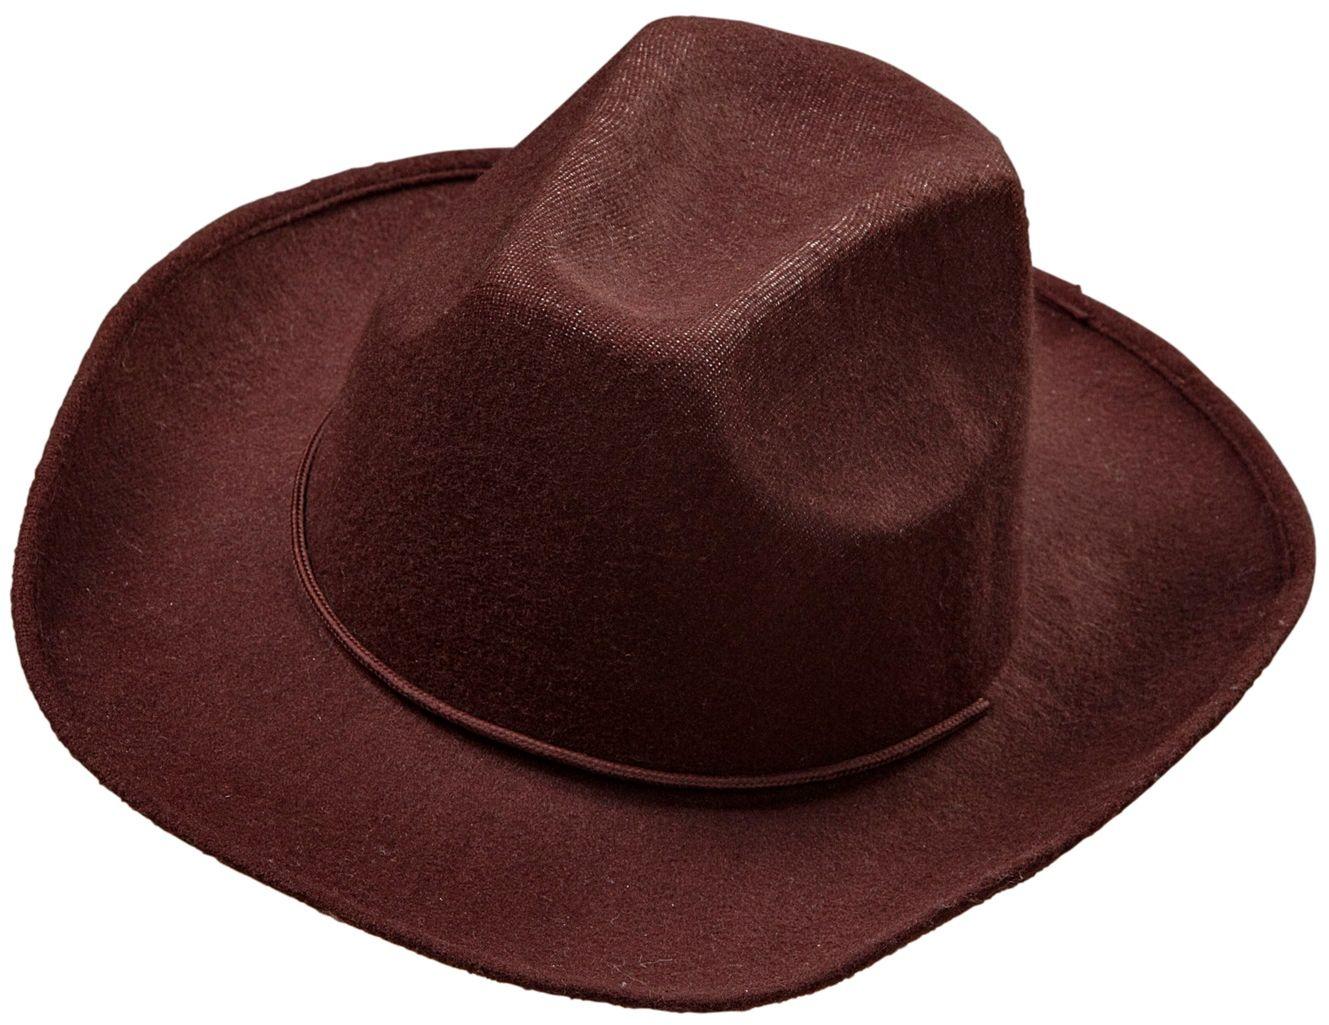 Bruine cowboyhoed